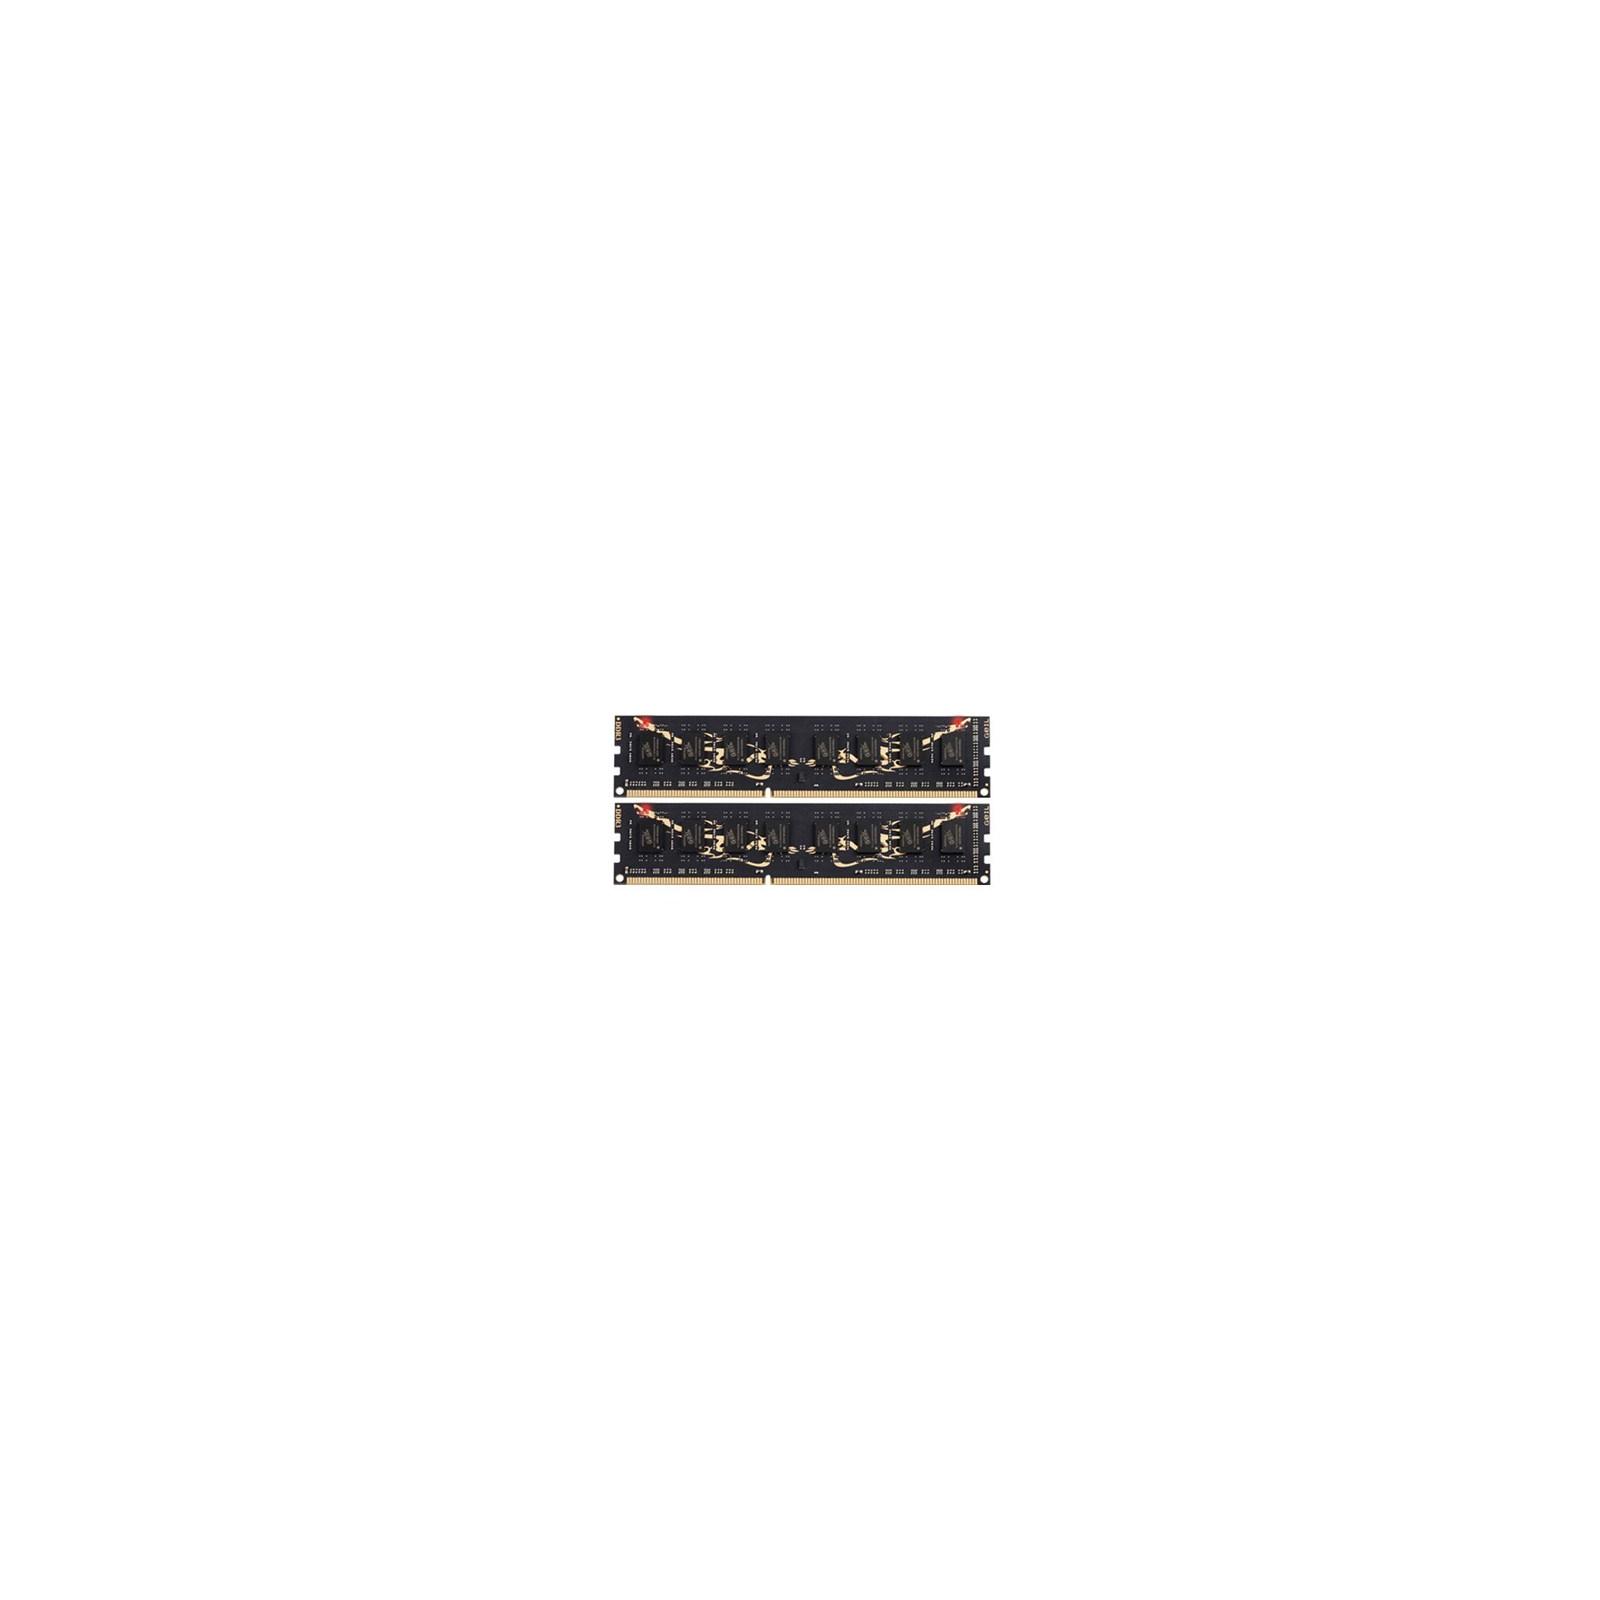 Модуль памяти для компьютера DDR3 4GB (2x2GB) 1333 MHz GEIL (GB34GB1333C7DC)